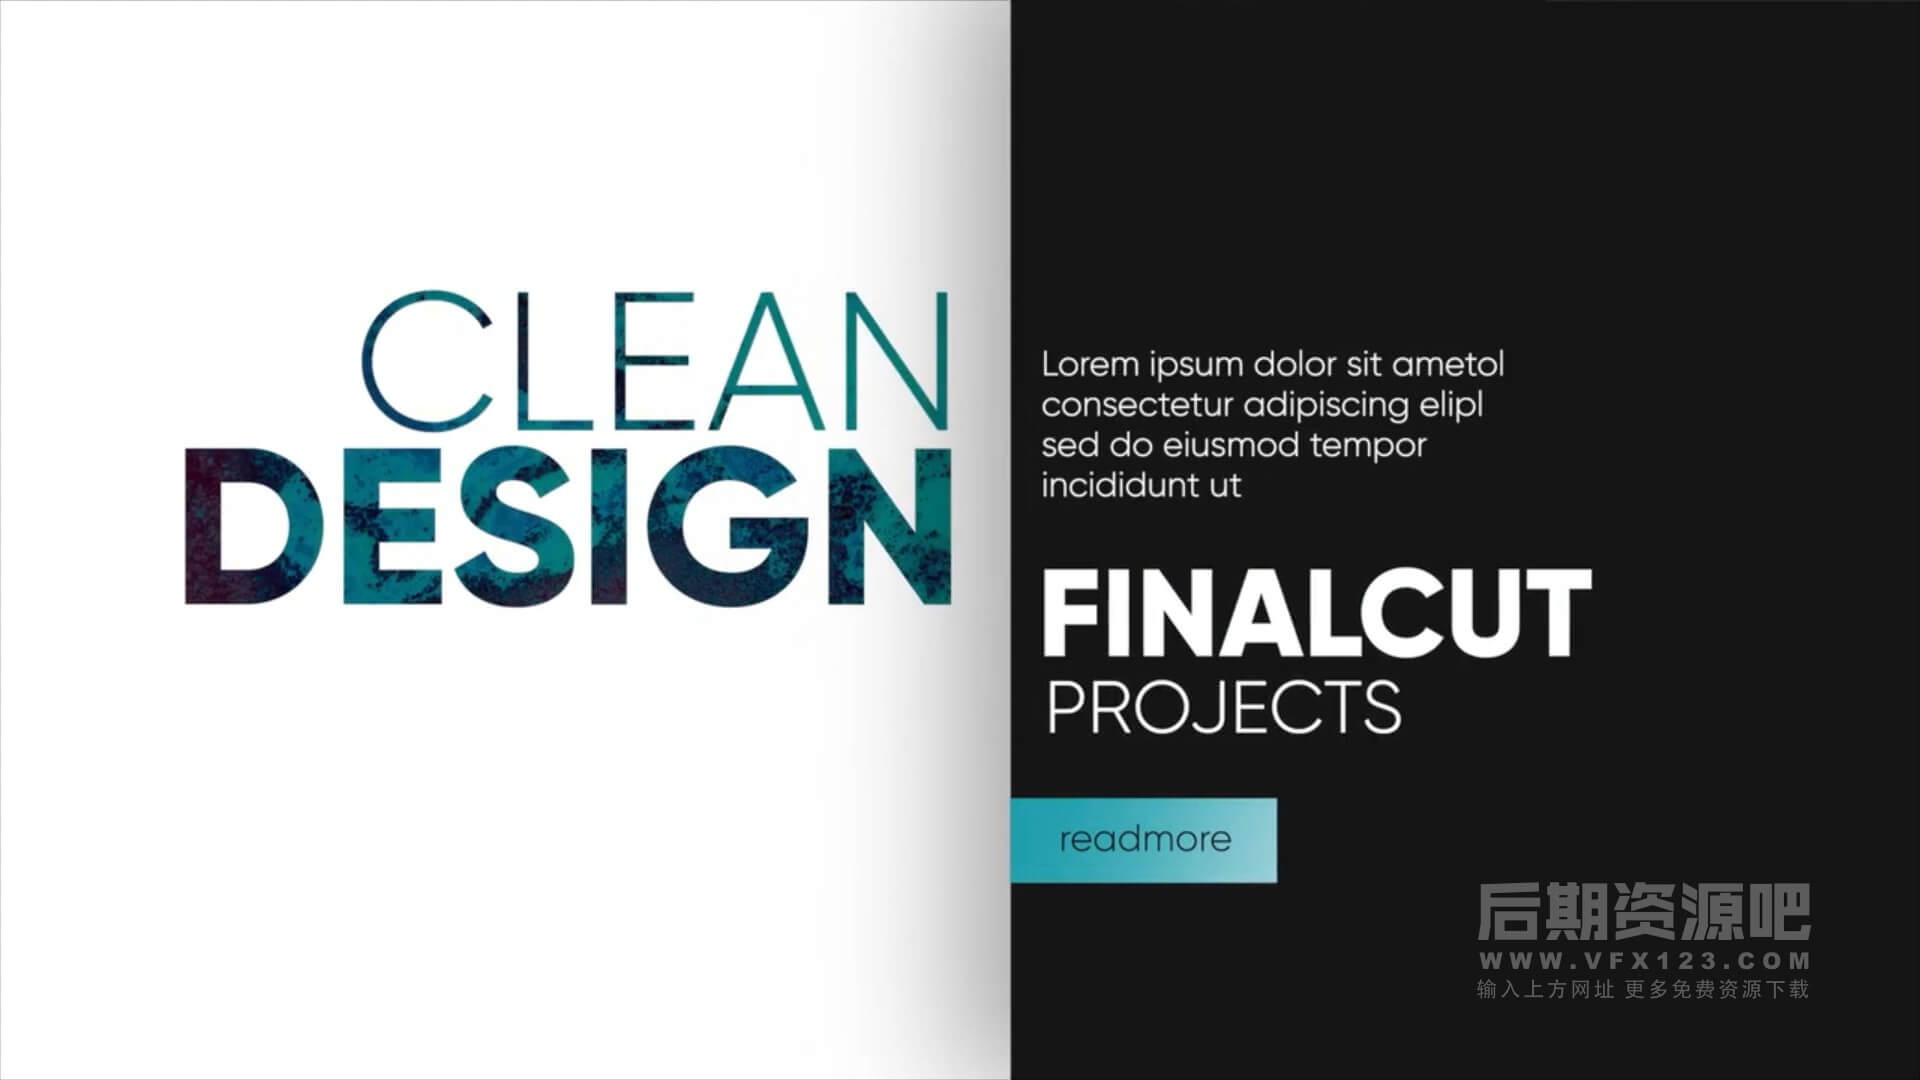 fcpx插件 创意大标题图文排版动画 Creative typography v3